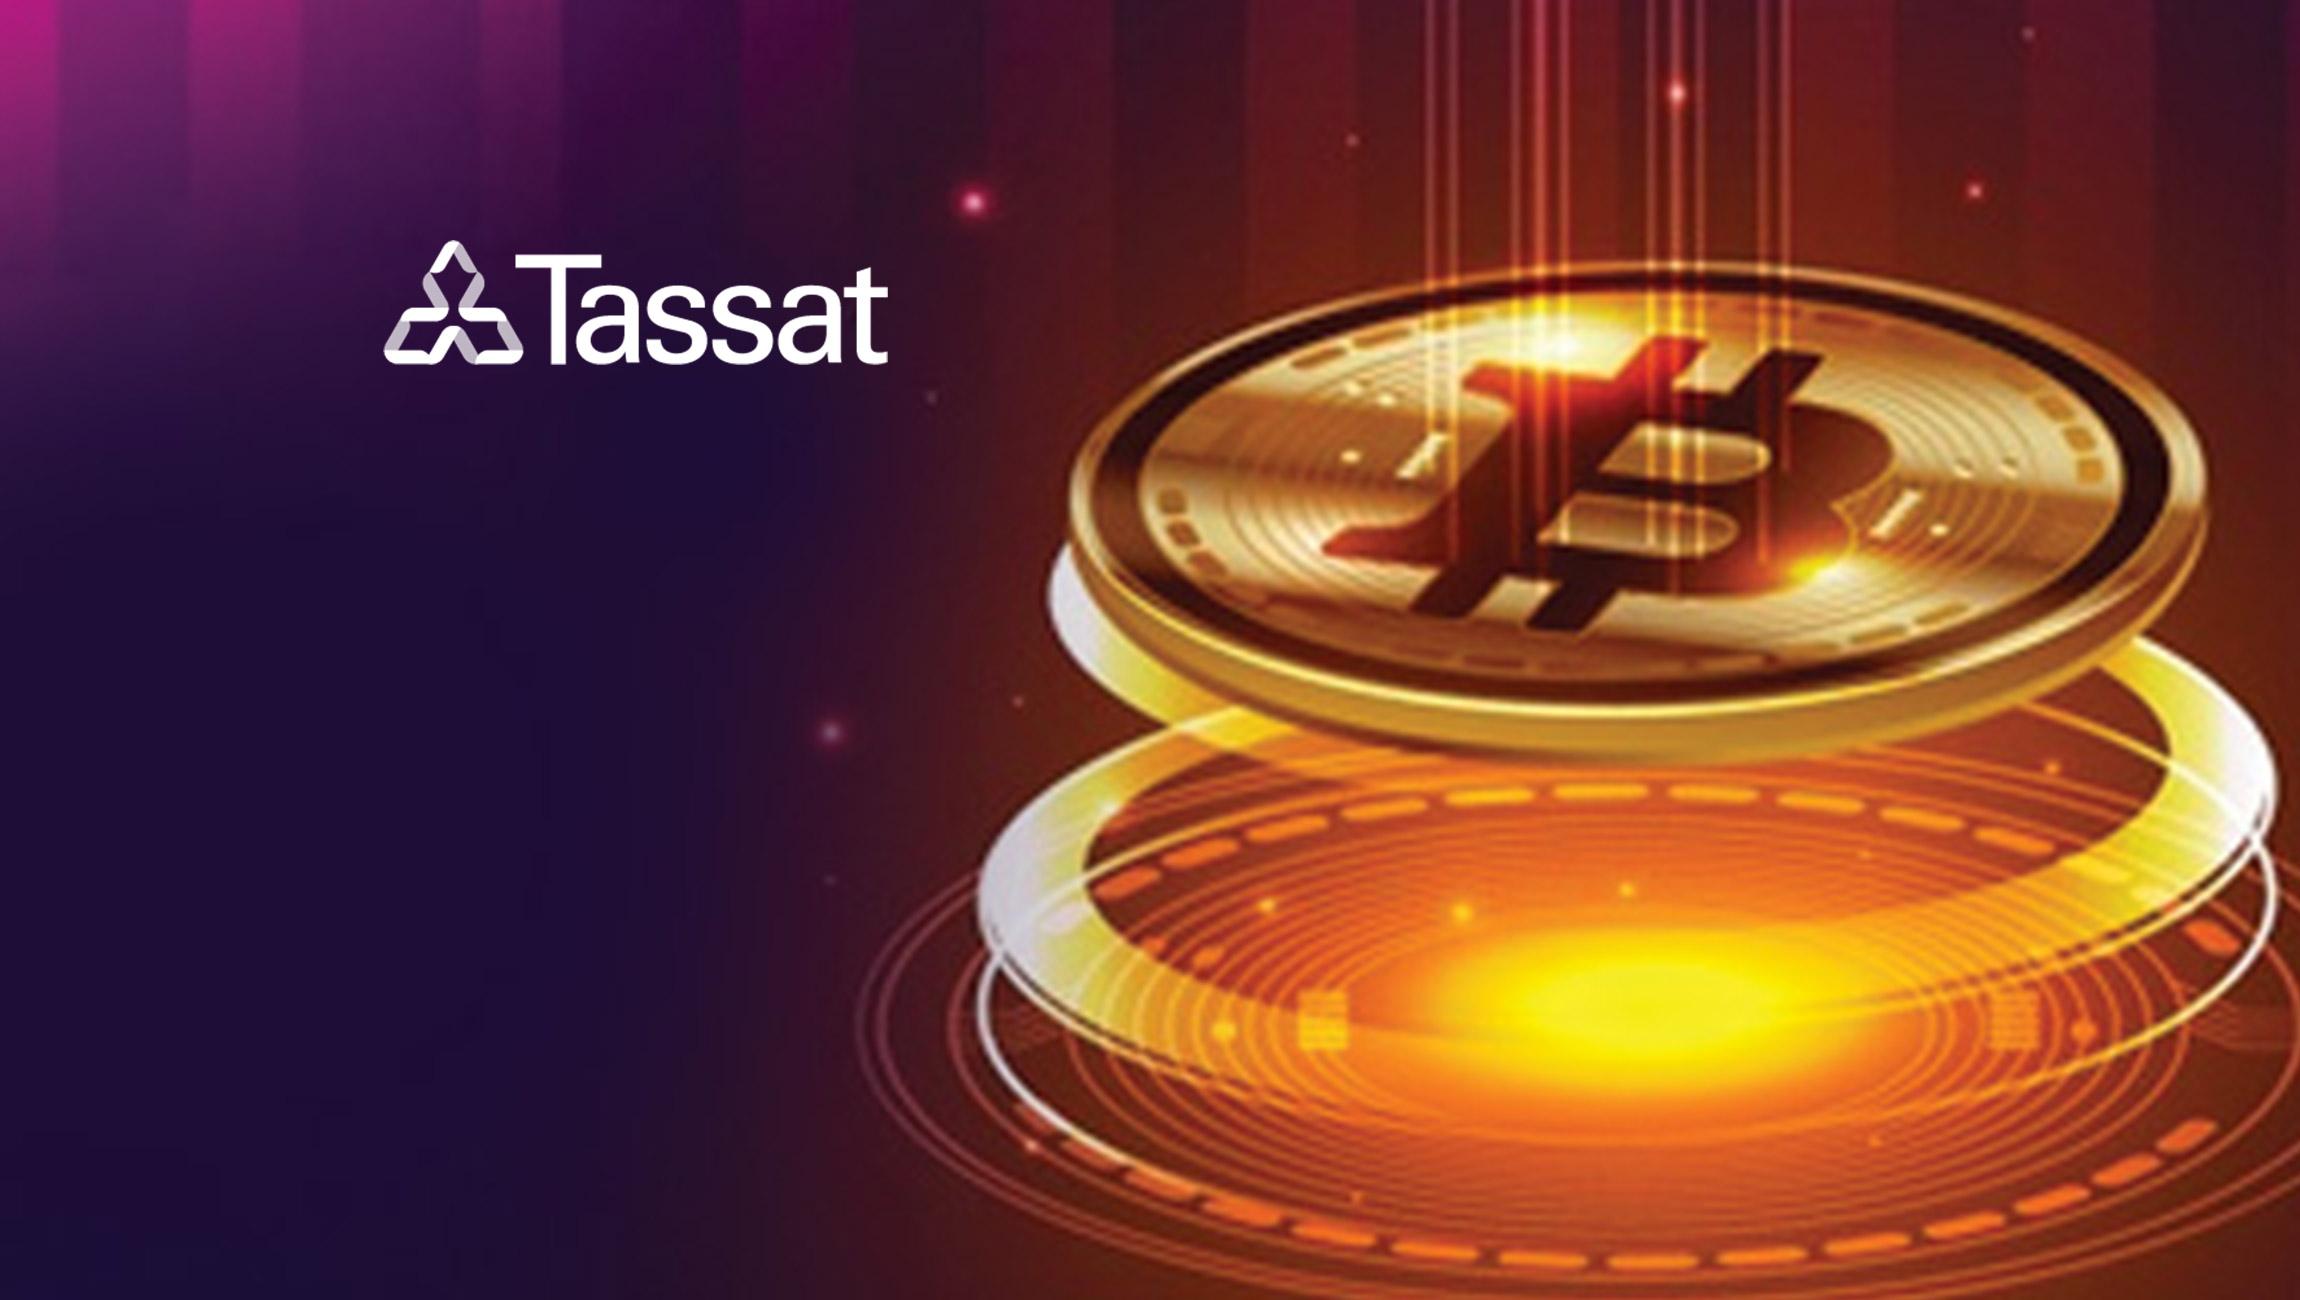 gumi Cryptos Capital and Hashkey Capital Invest in Tassat Accelerating Blockchain Based Digital Cash Adoption in Asia